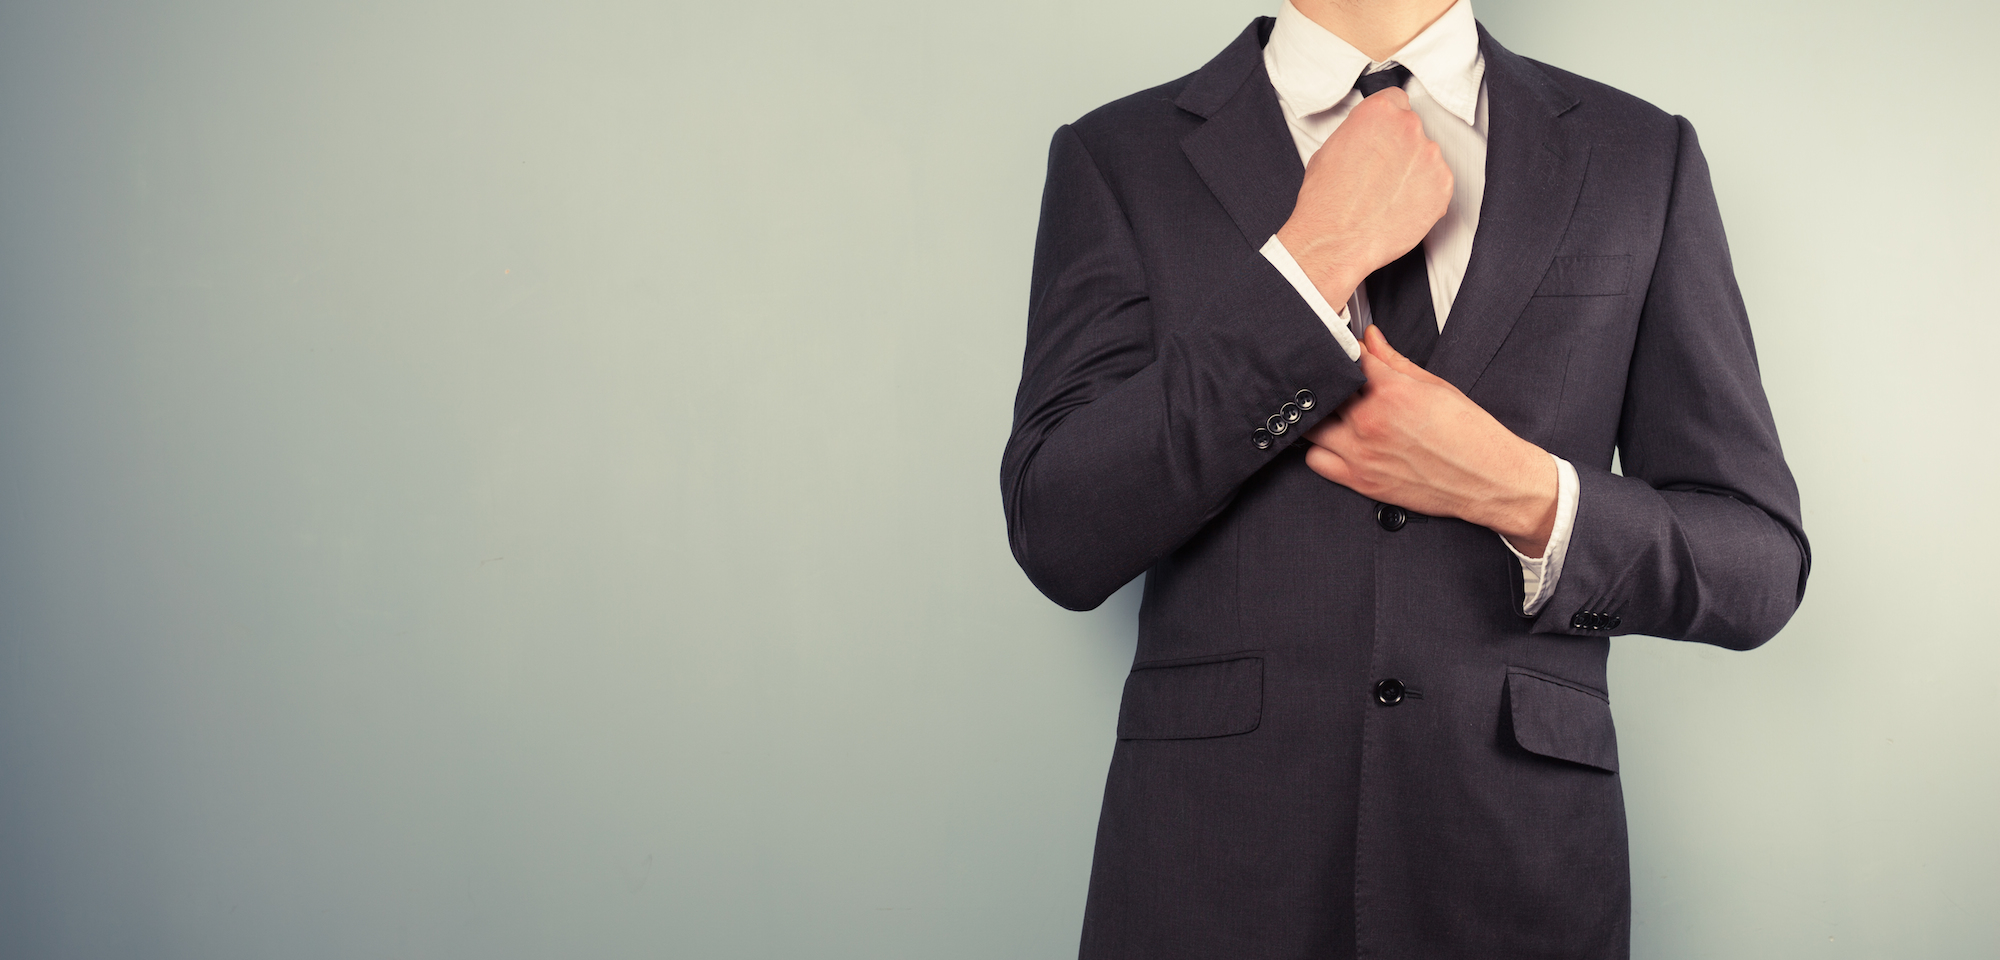 suit-tie-businessman.jpg